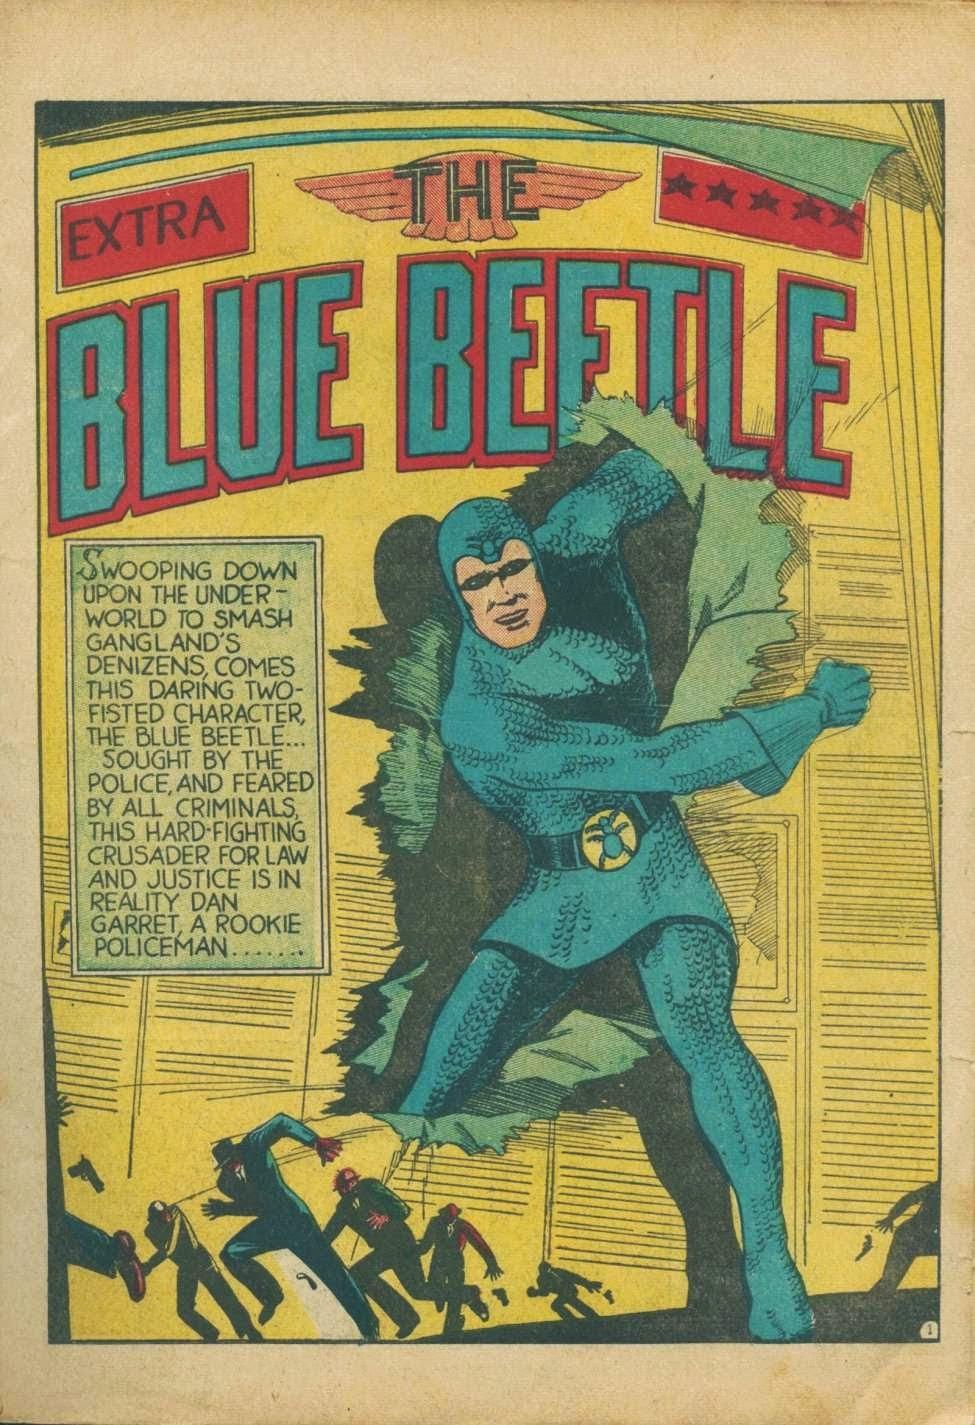 BLUE BEETLE: B.C.